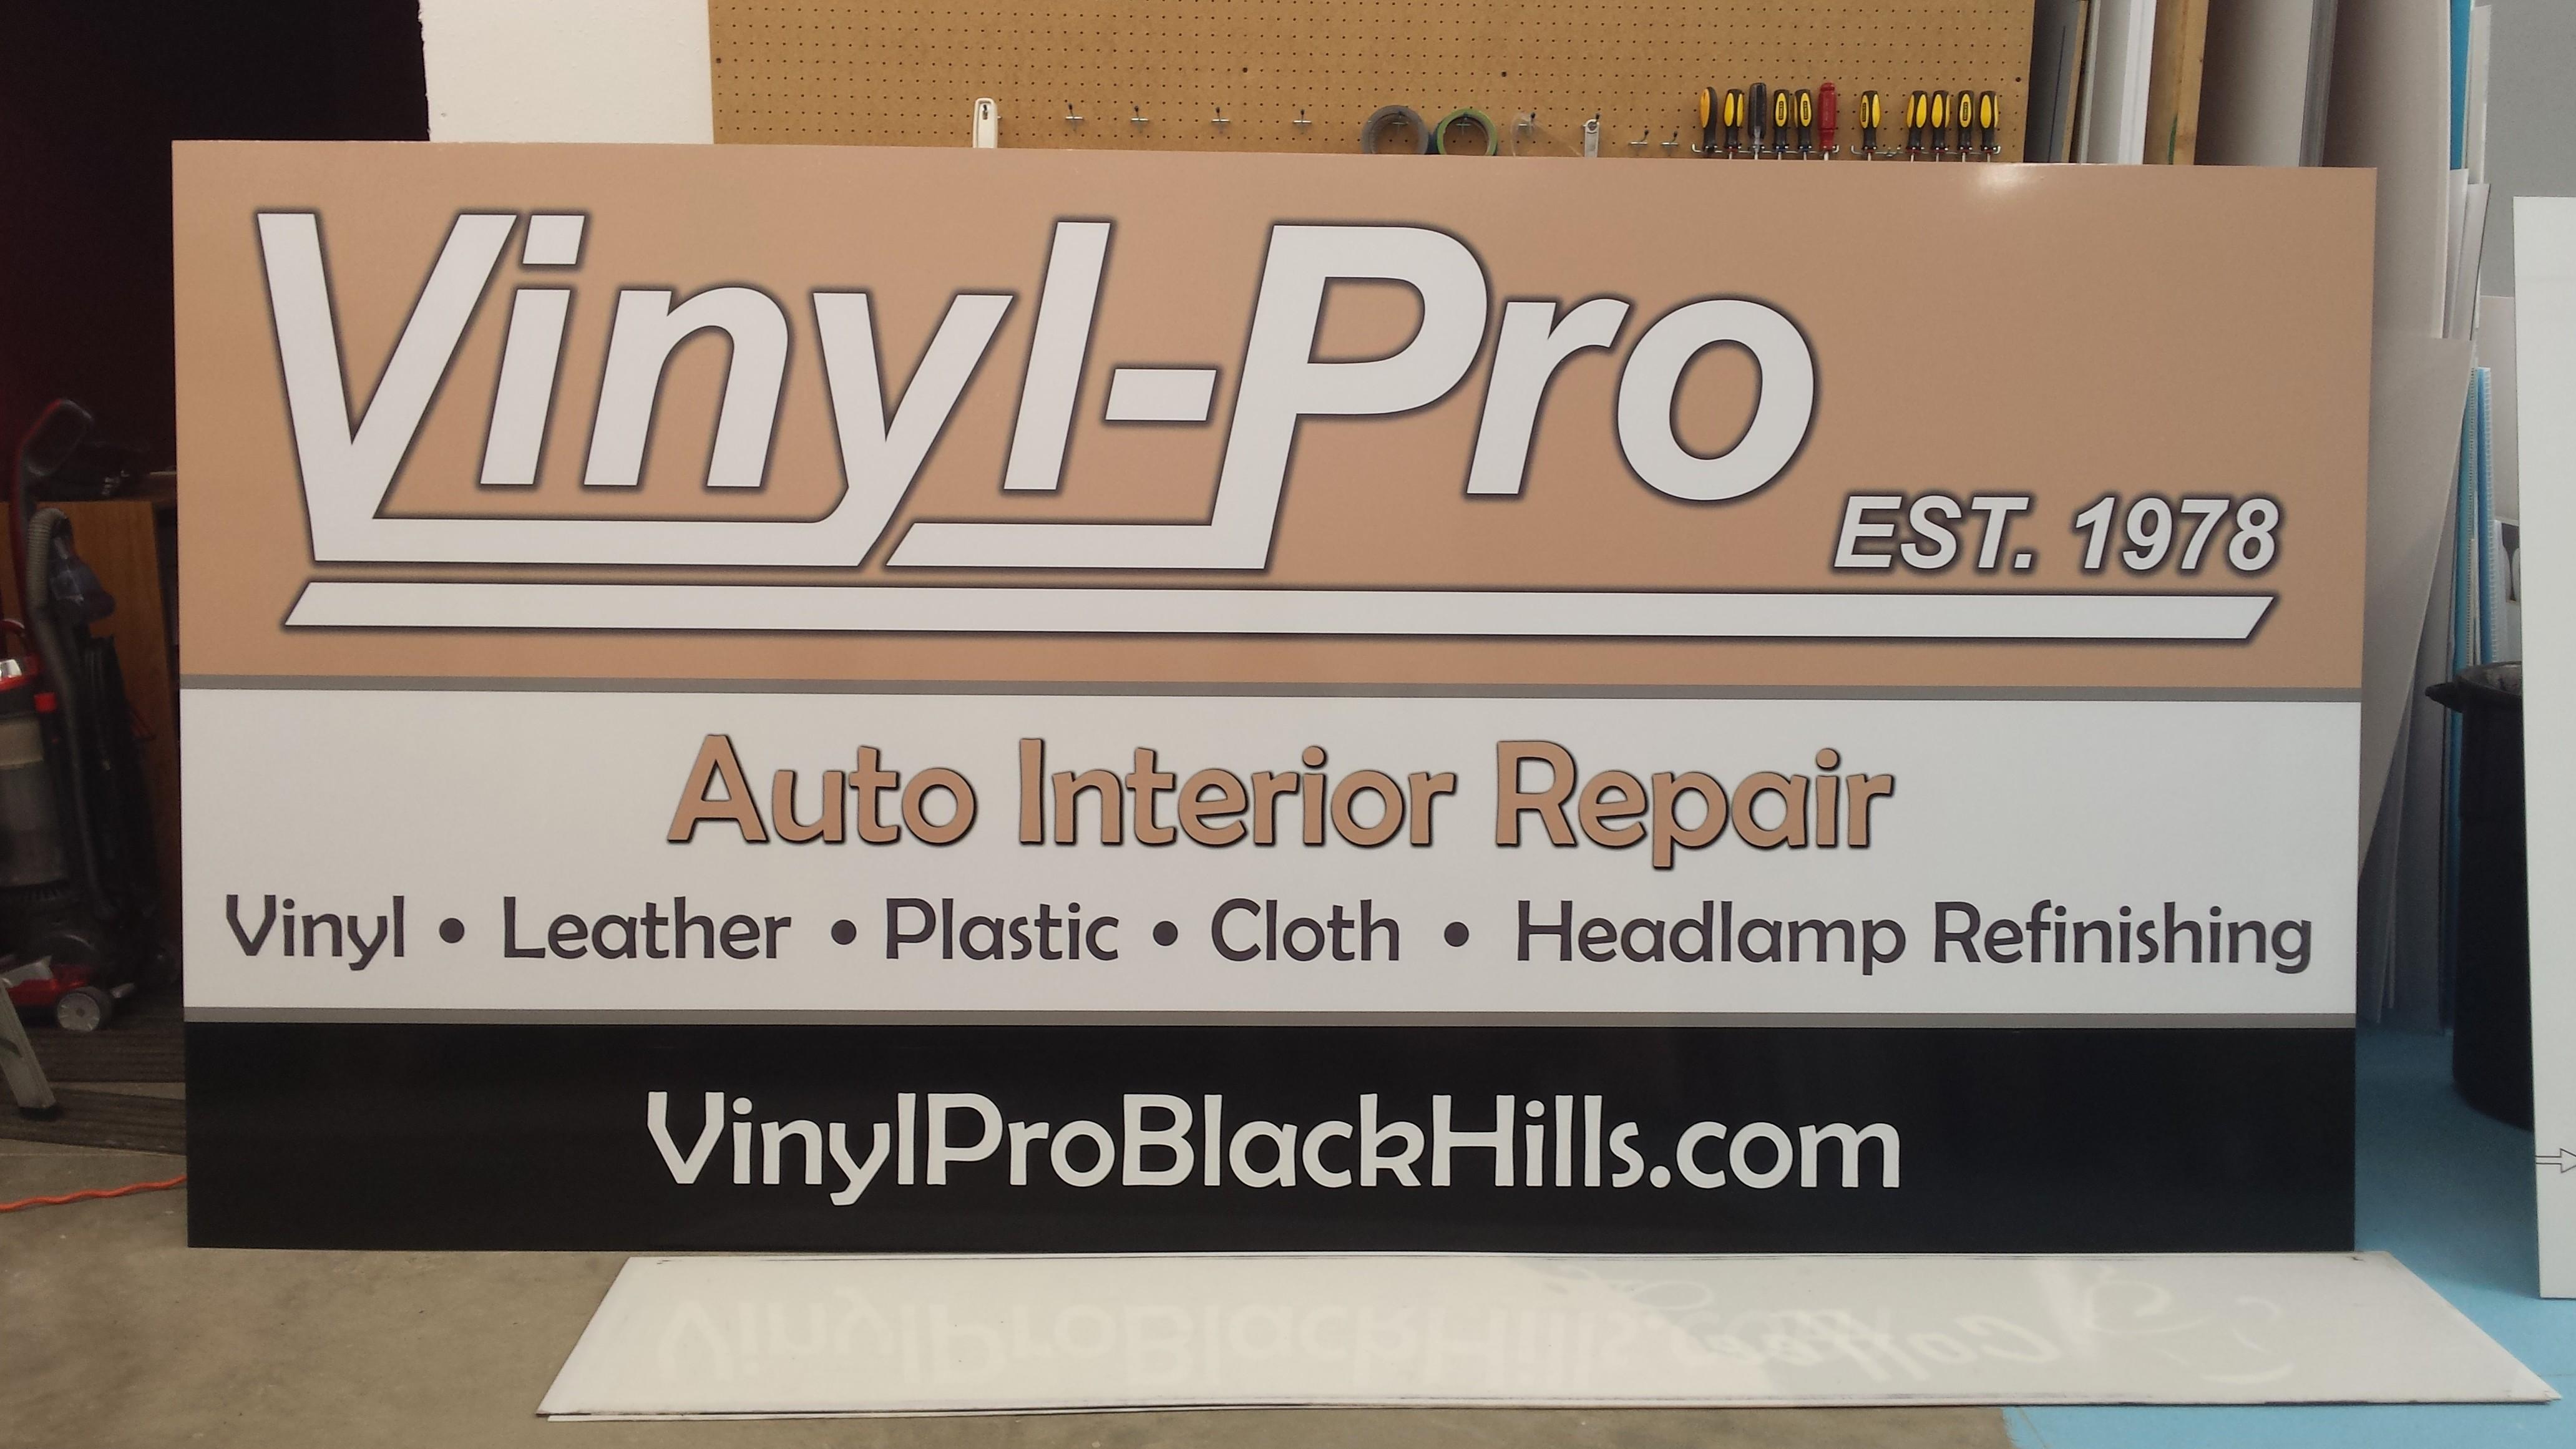 Vinyl-Pro